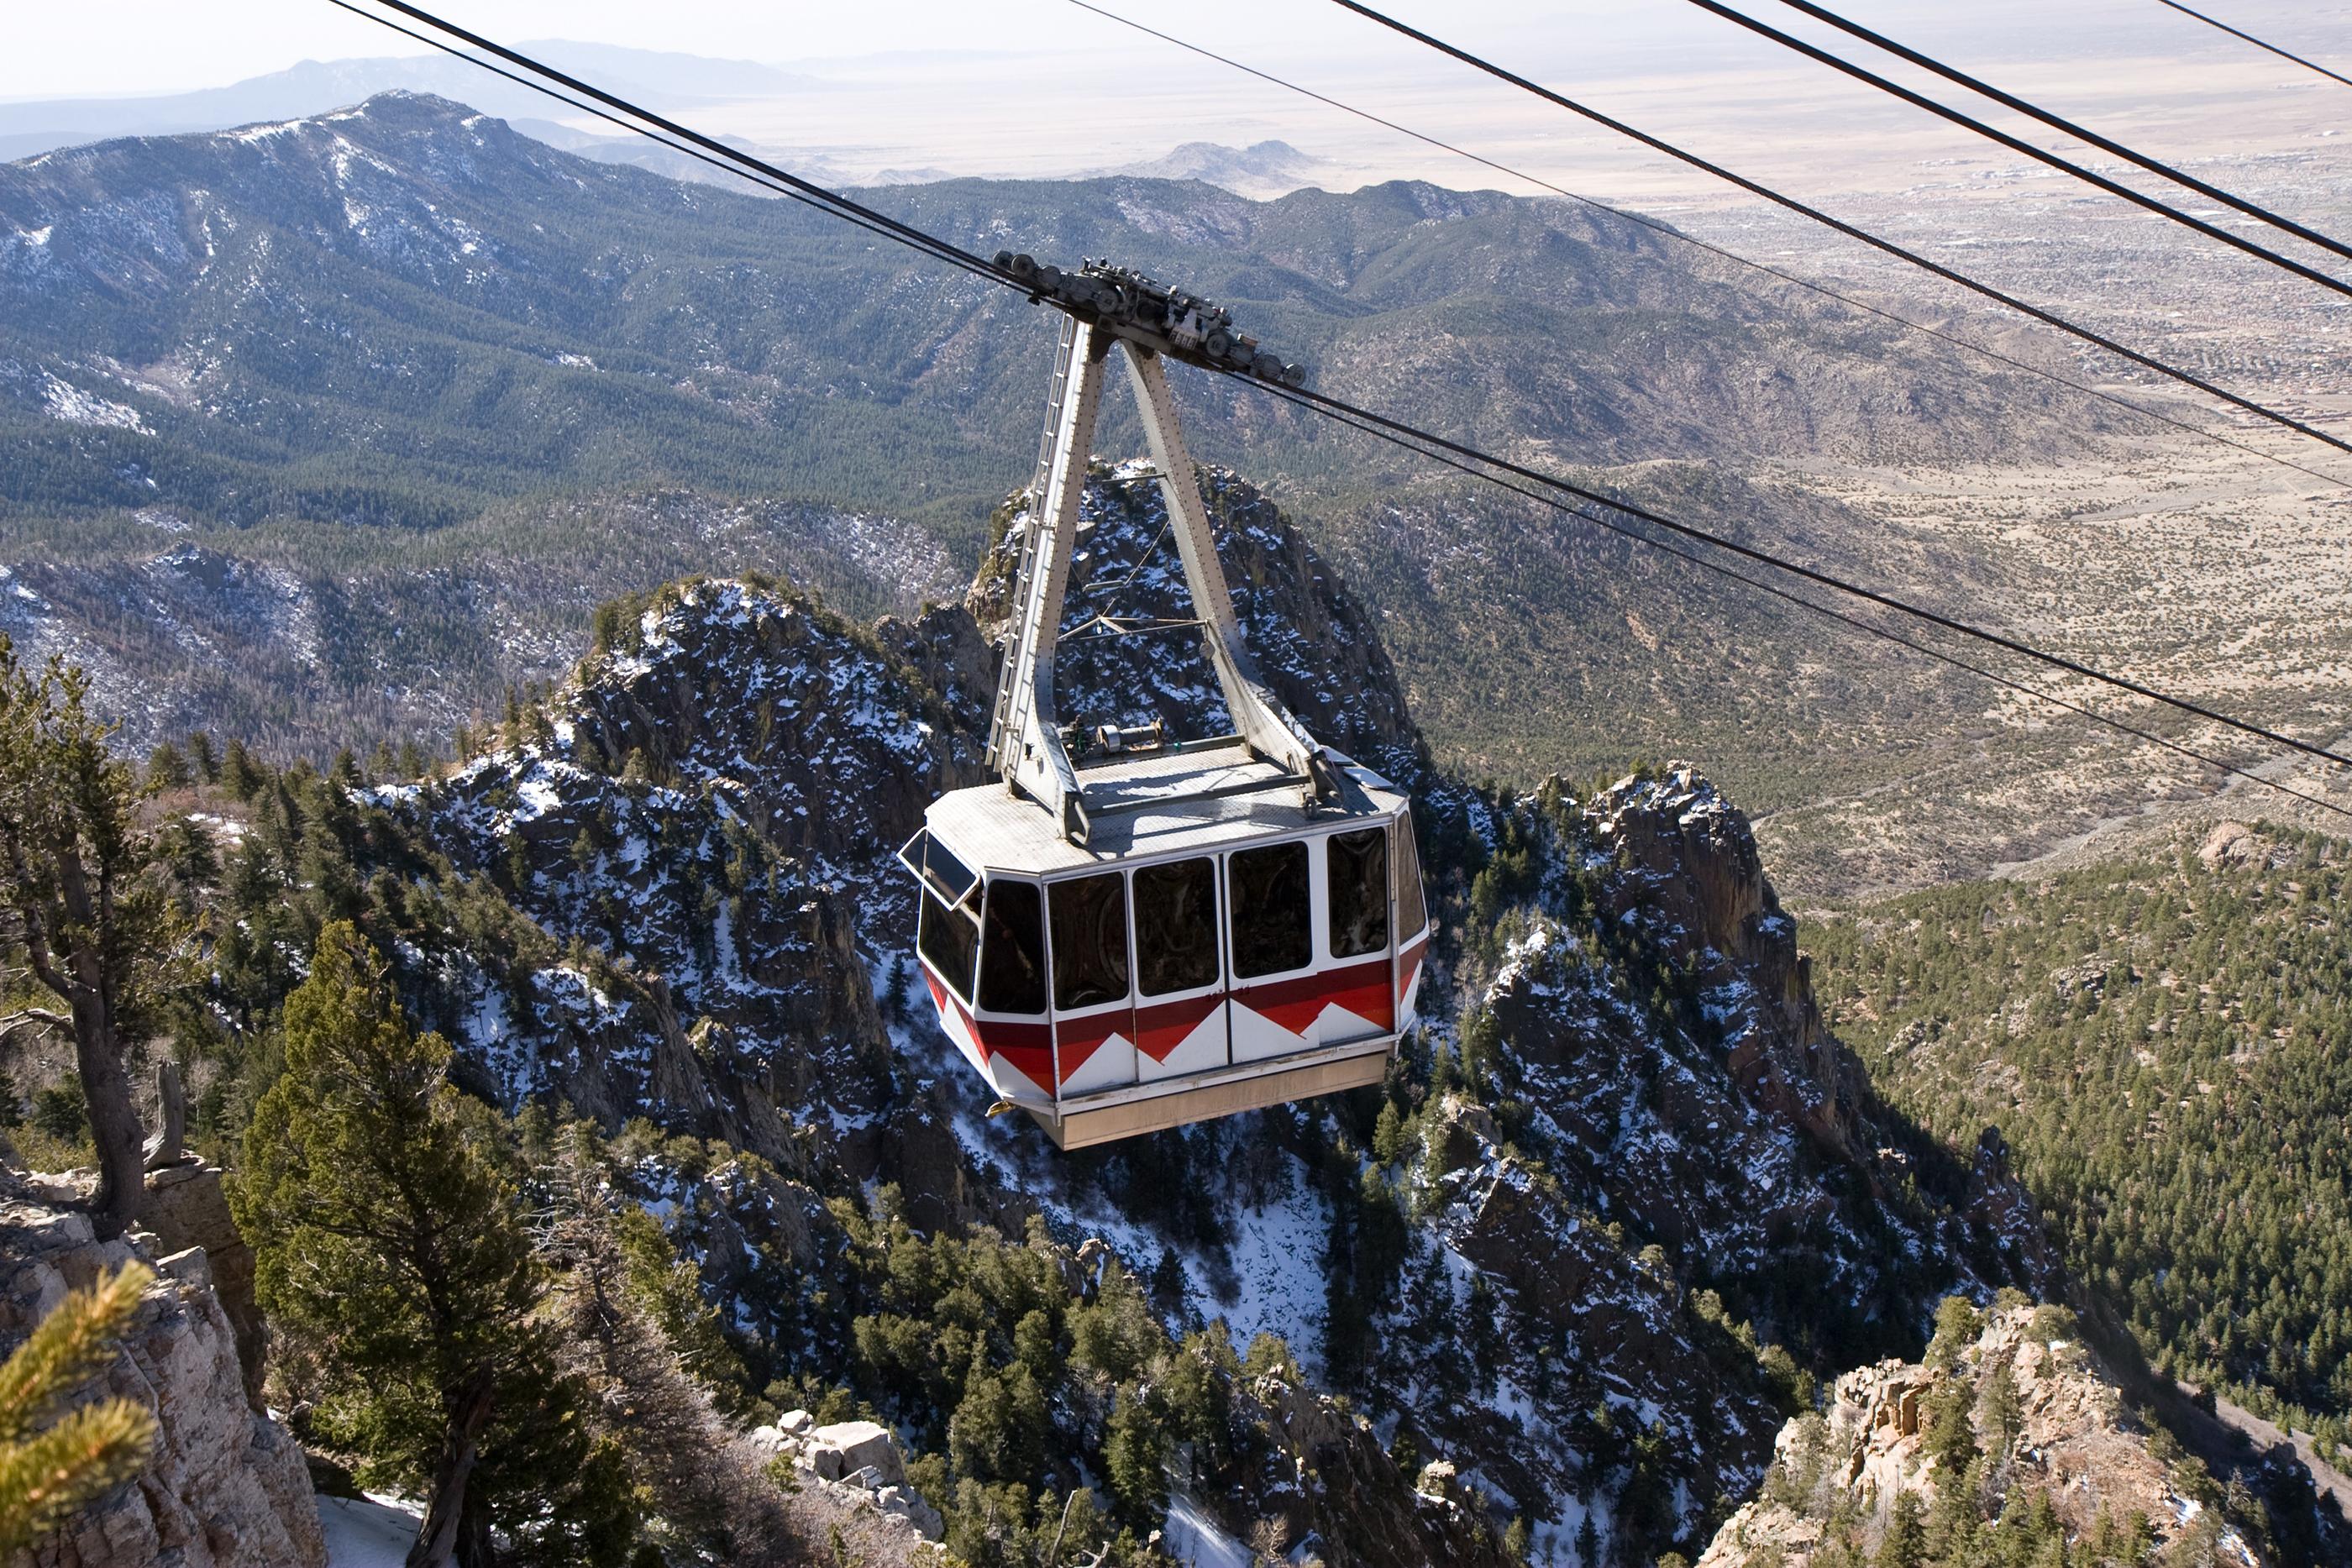 170815-route-66-sandia-peak-tramway